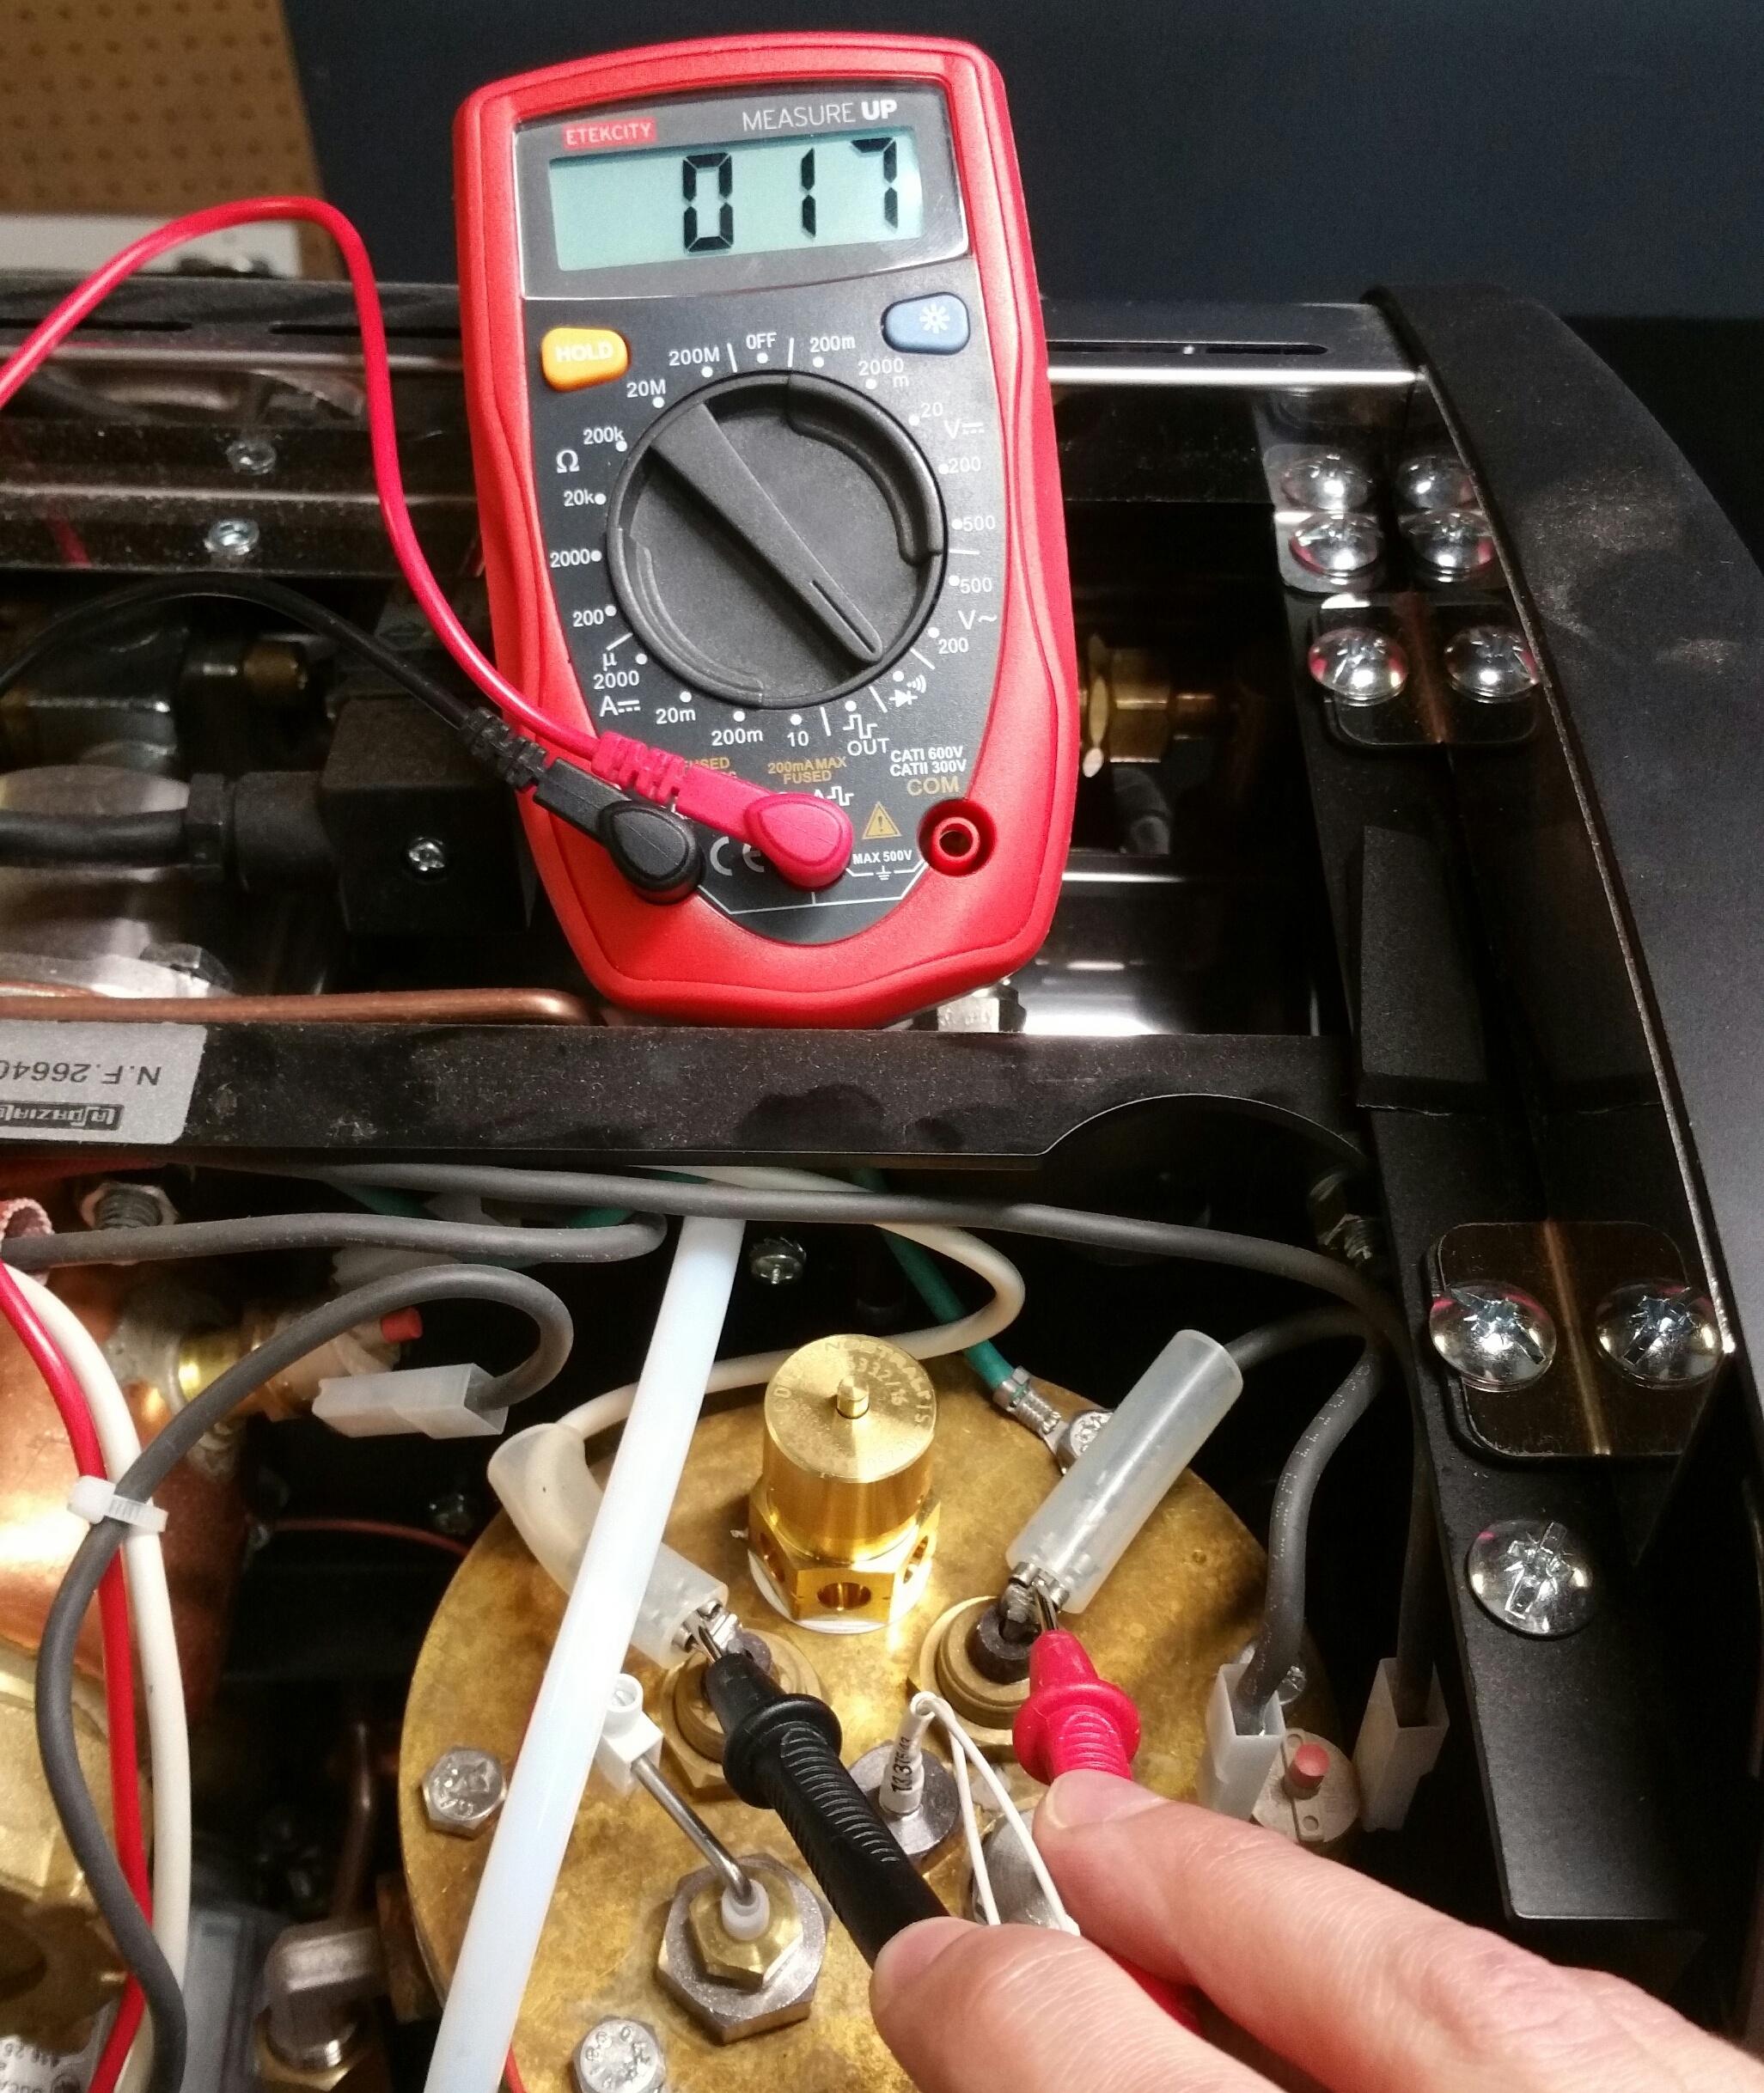 LUCCA A53 Mini: Steam Boiler Not Heating